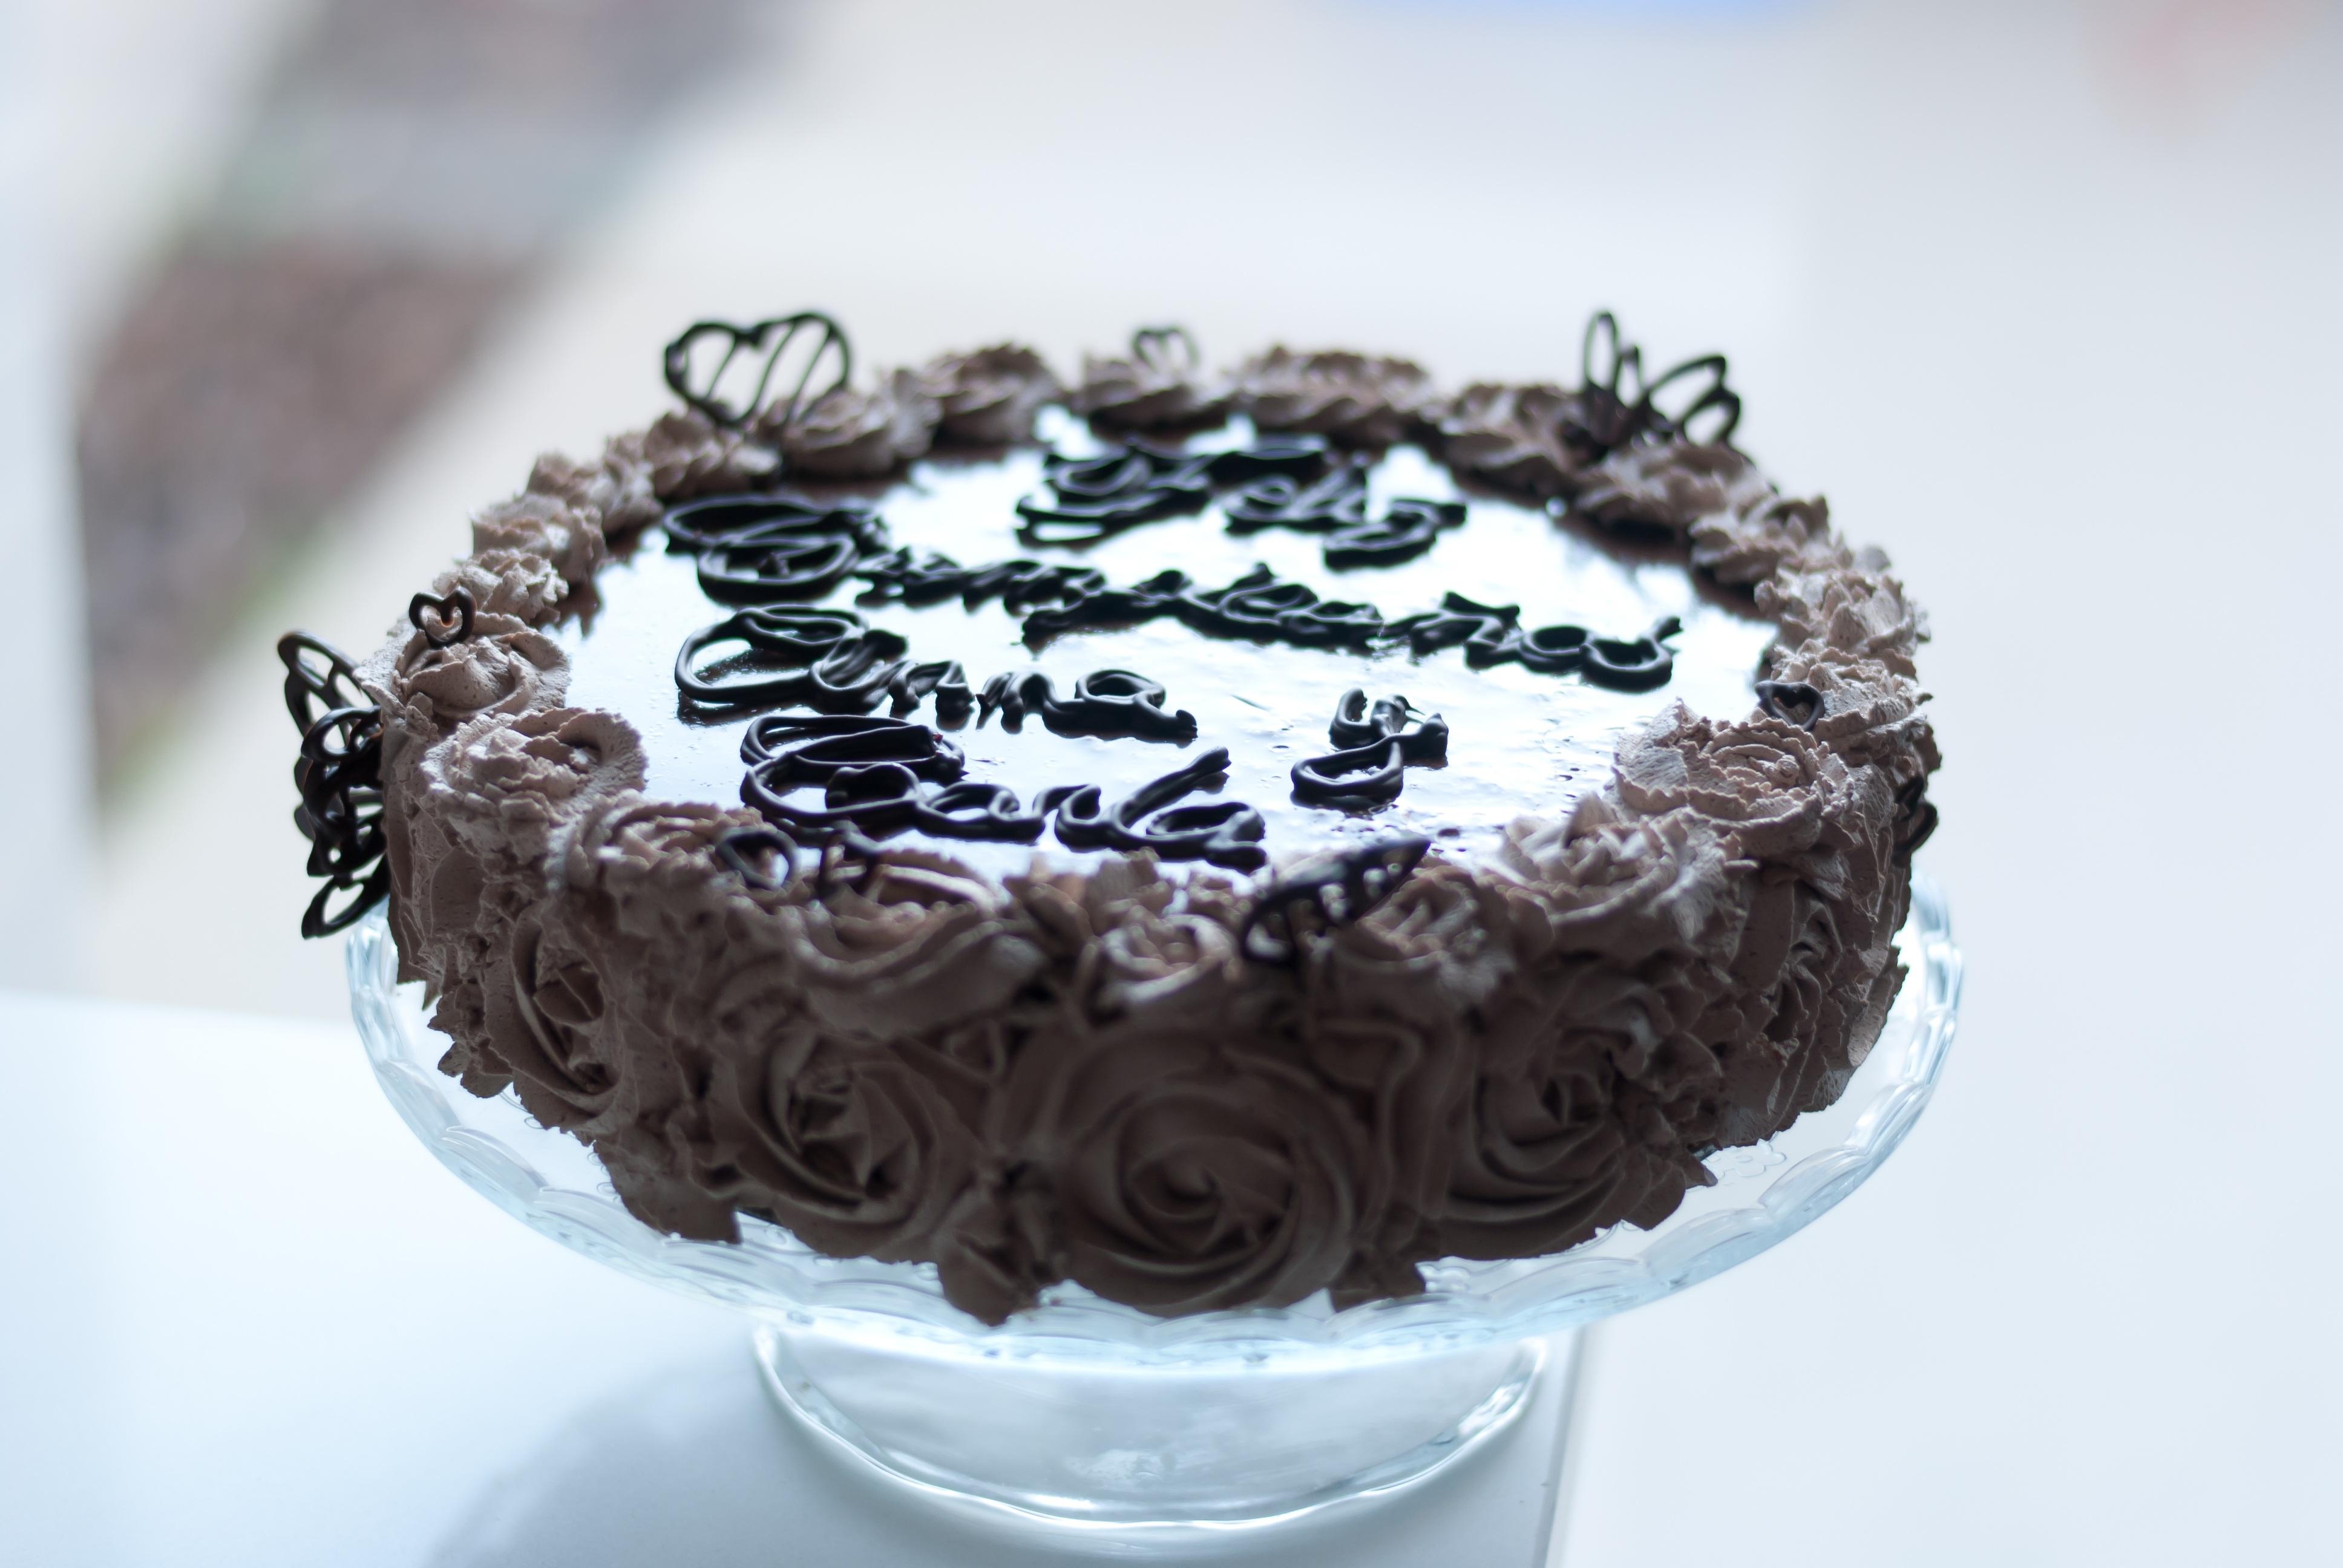 Free Images : sweet, food, dessert, cuisine, pie, birthday cake